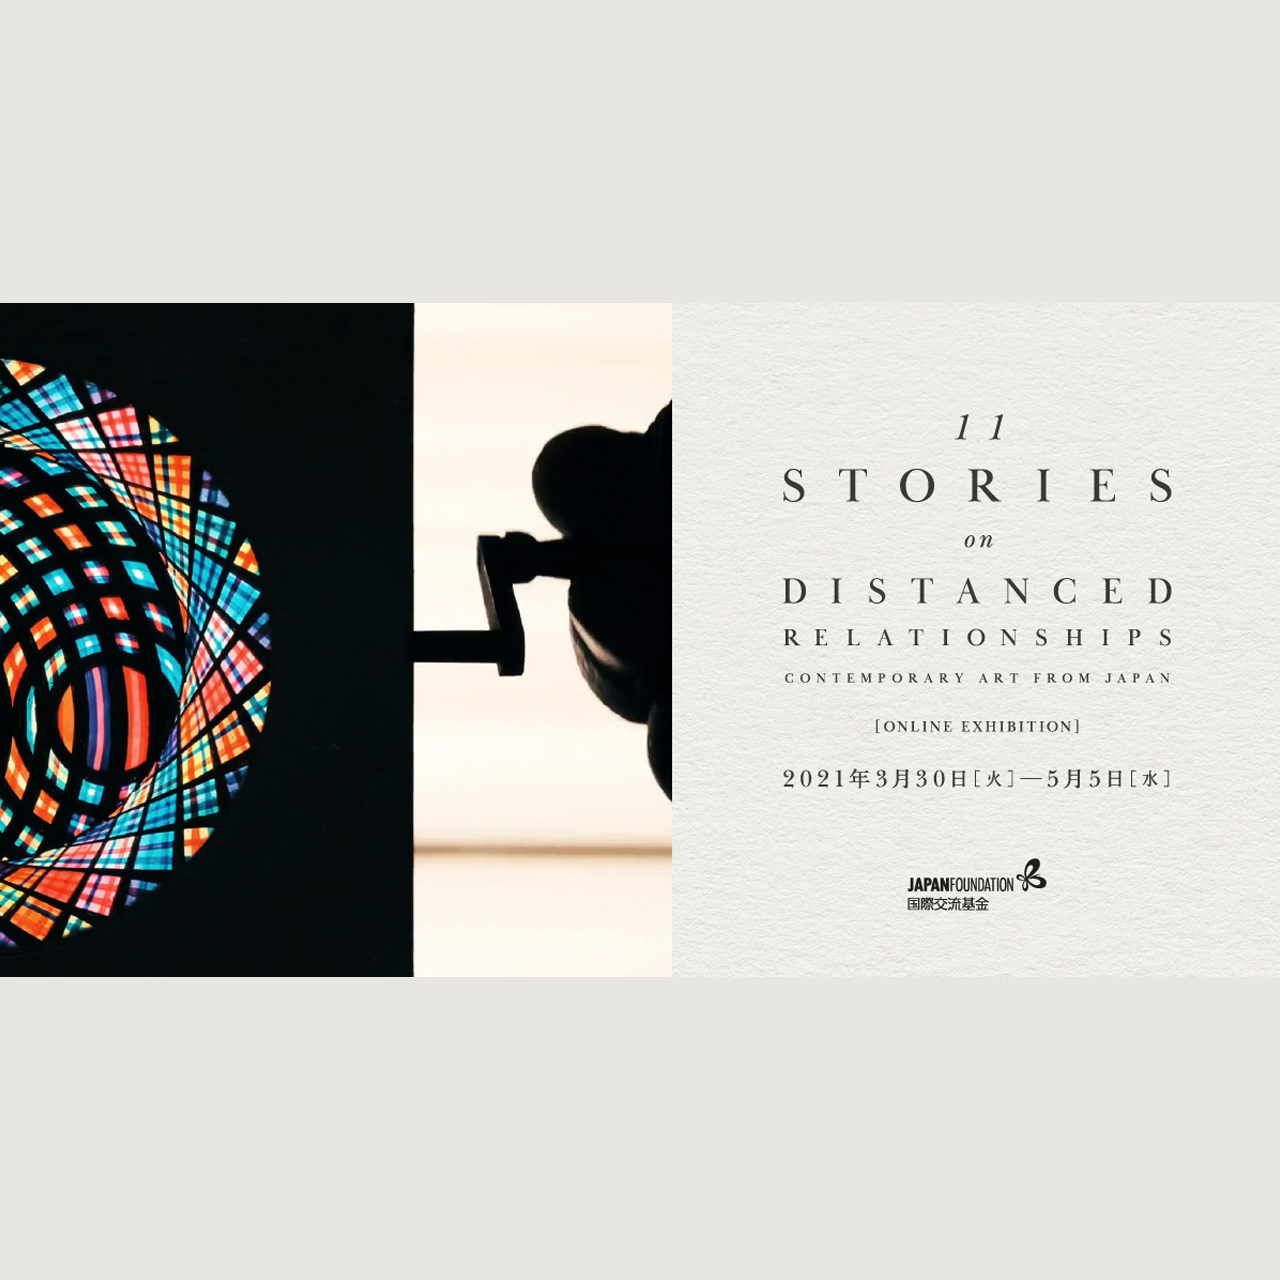 memo/鑑賞きろく/距離をめぐる11の物語:日本の現代美術